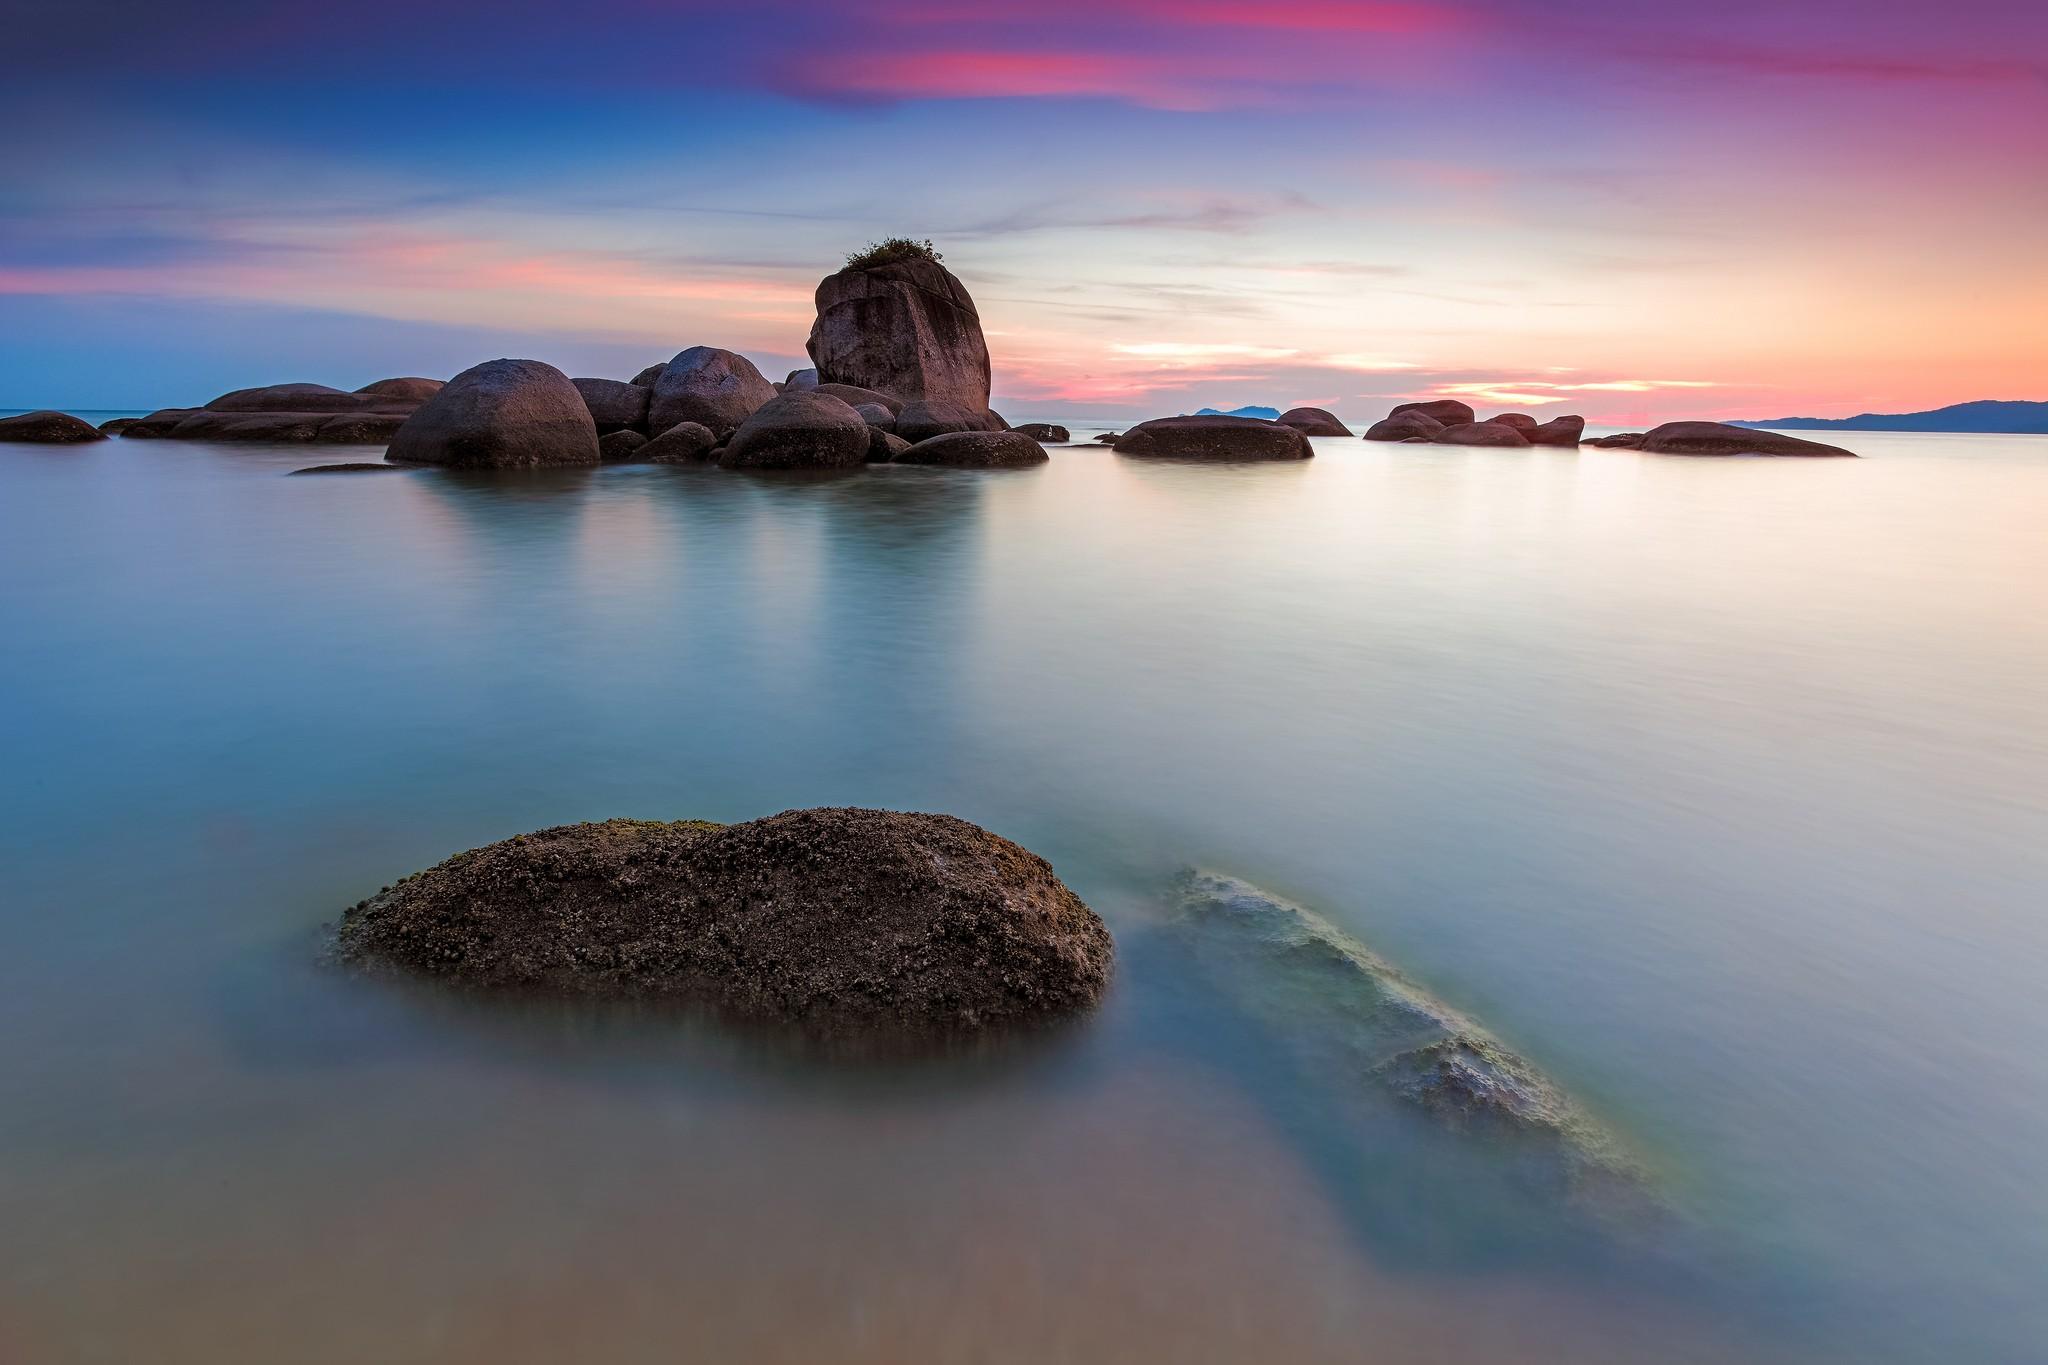 природа море горизонт камни облака небо скалы  № 432393 бесплатно